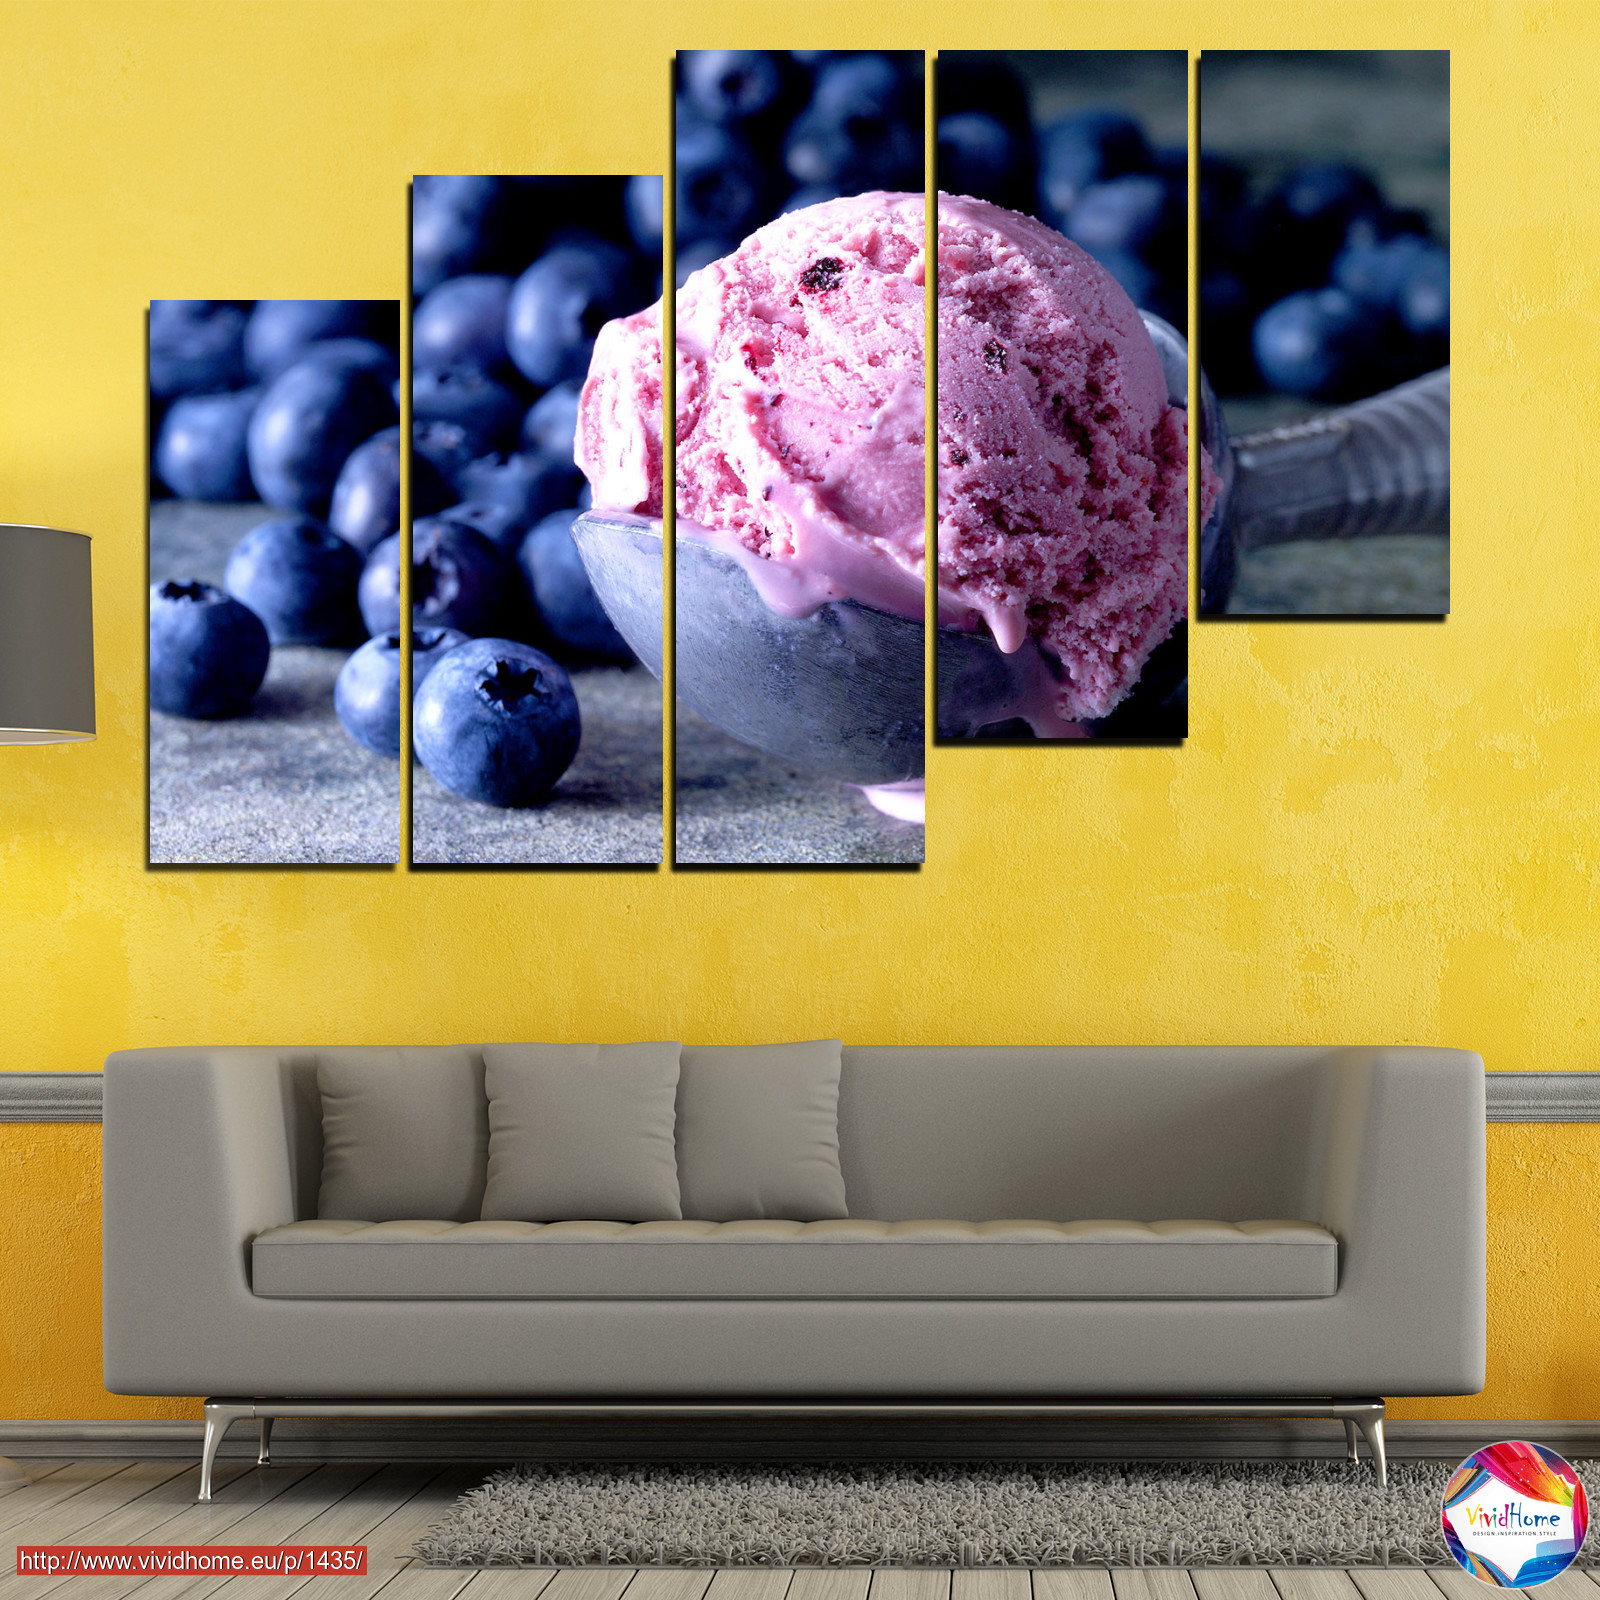 Fresh, Colorful, Natural, Food, Fruit, Dessert, Tasty, Sweet №0735